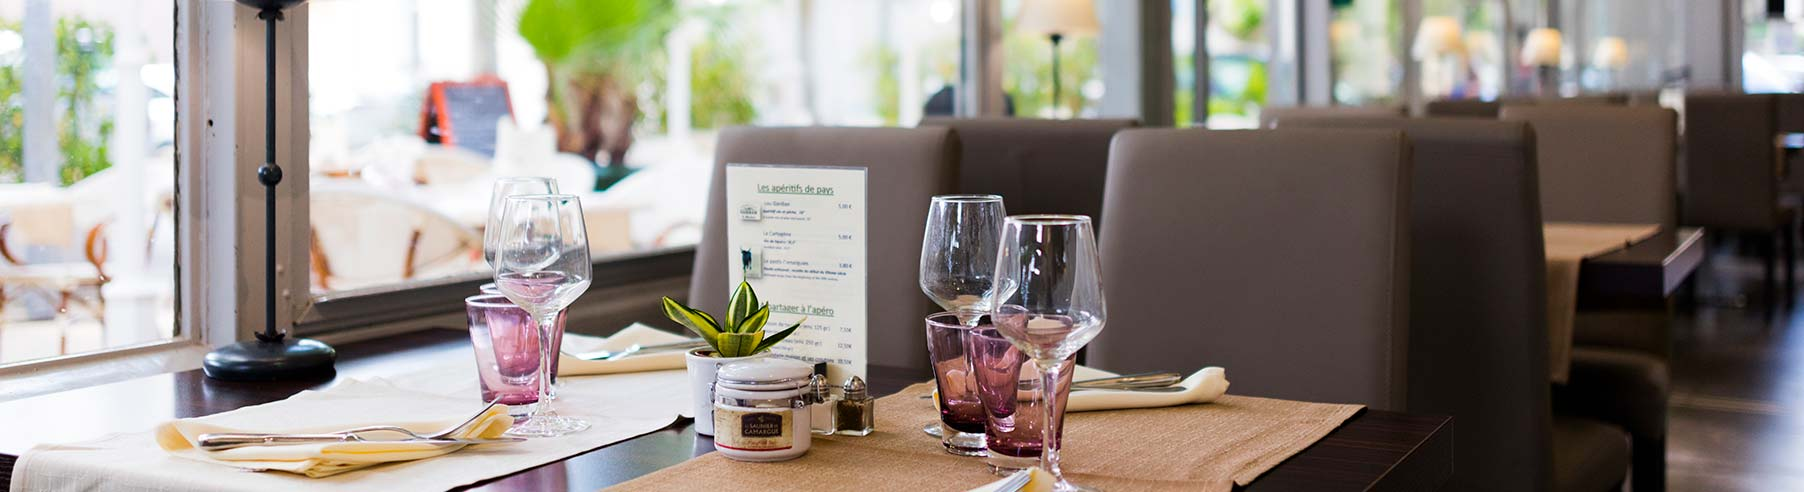 Hotel-Le-Cours---Restaurant